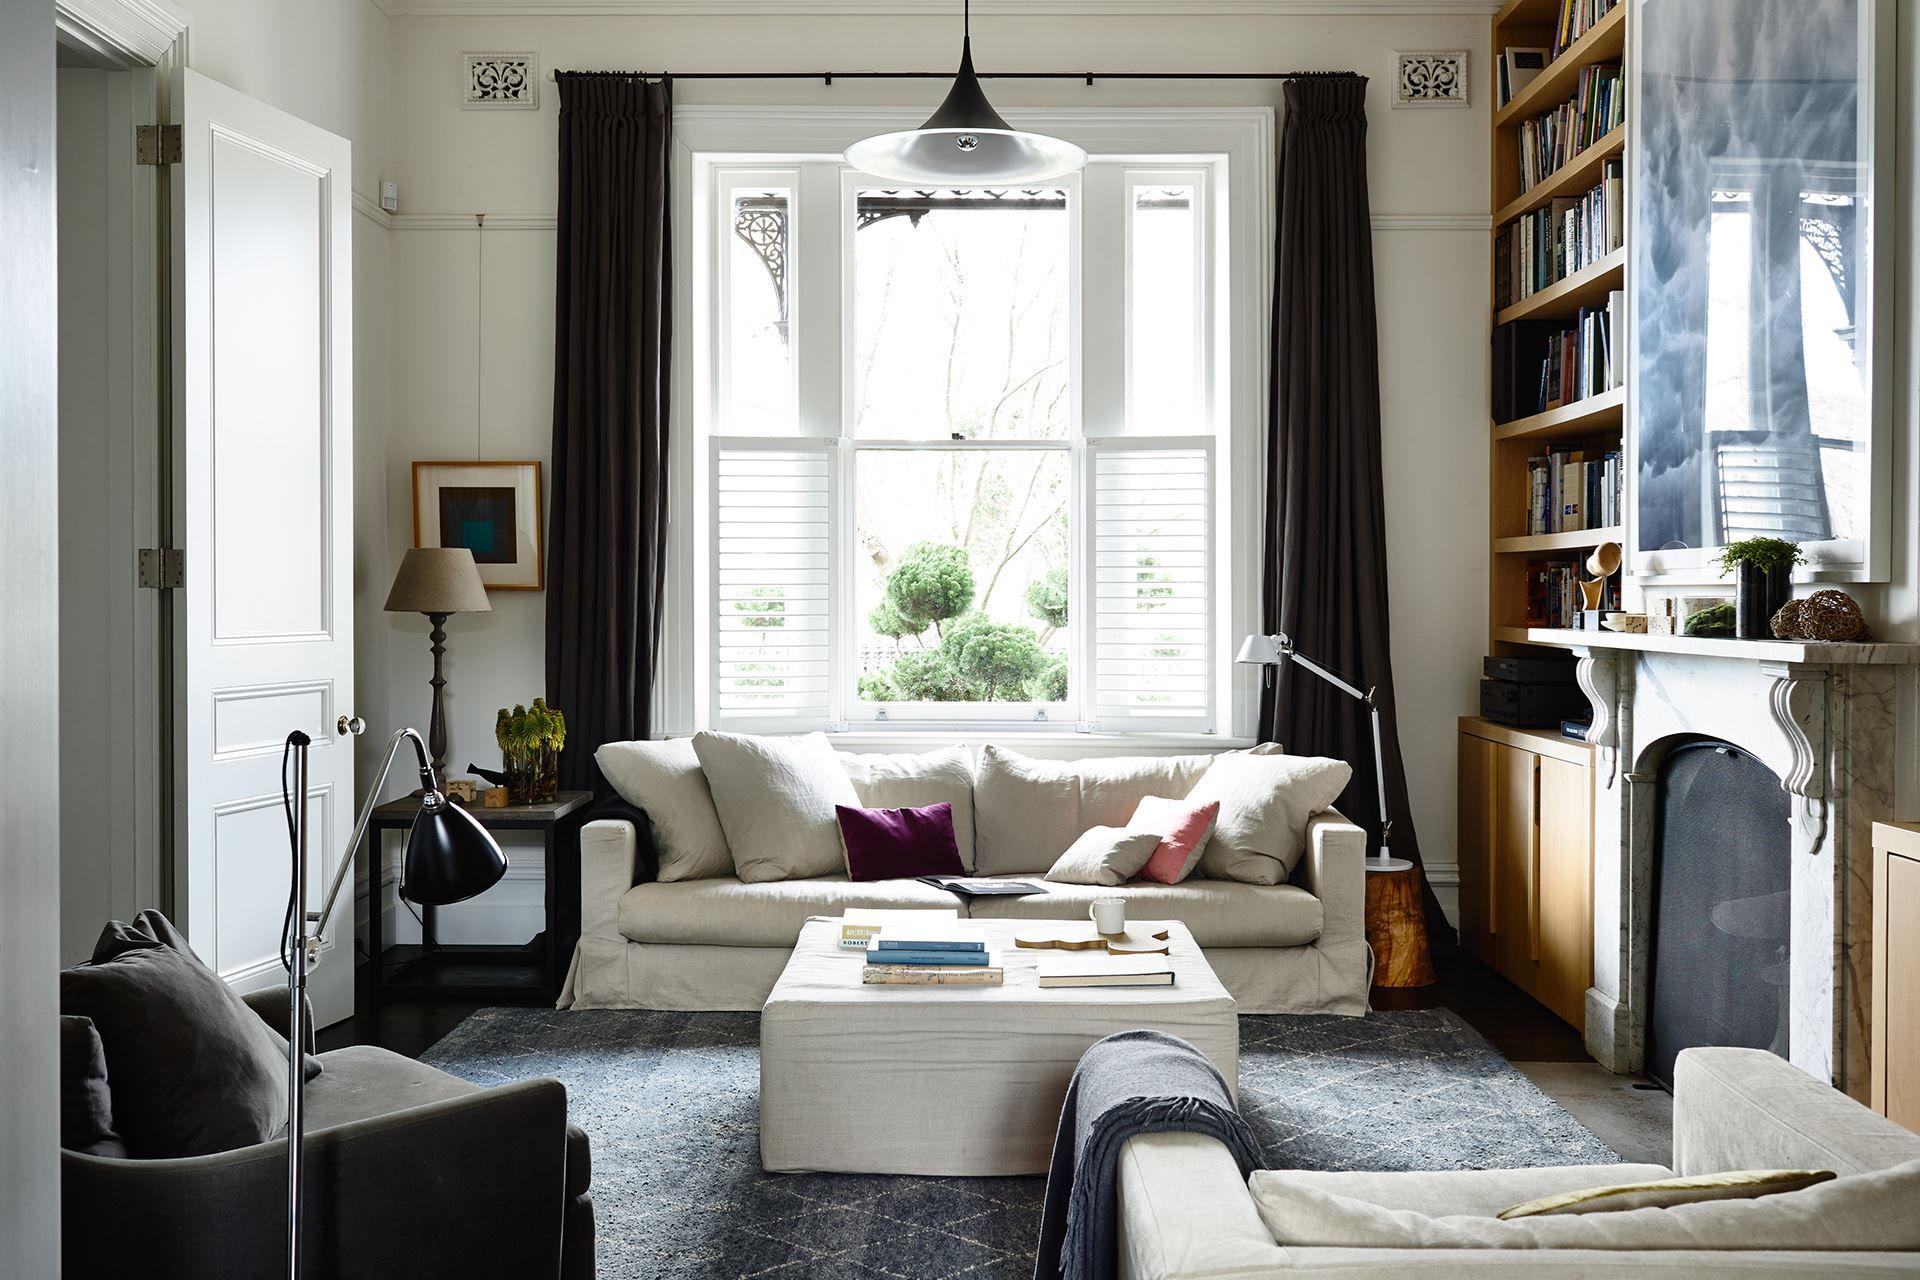 House Tour :: Modern & Rustic Victorian Terrace | Pinterest | House ...